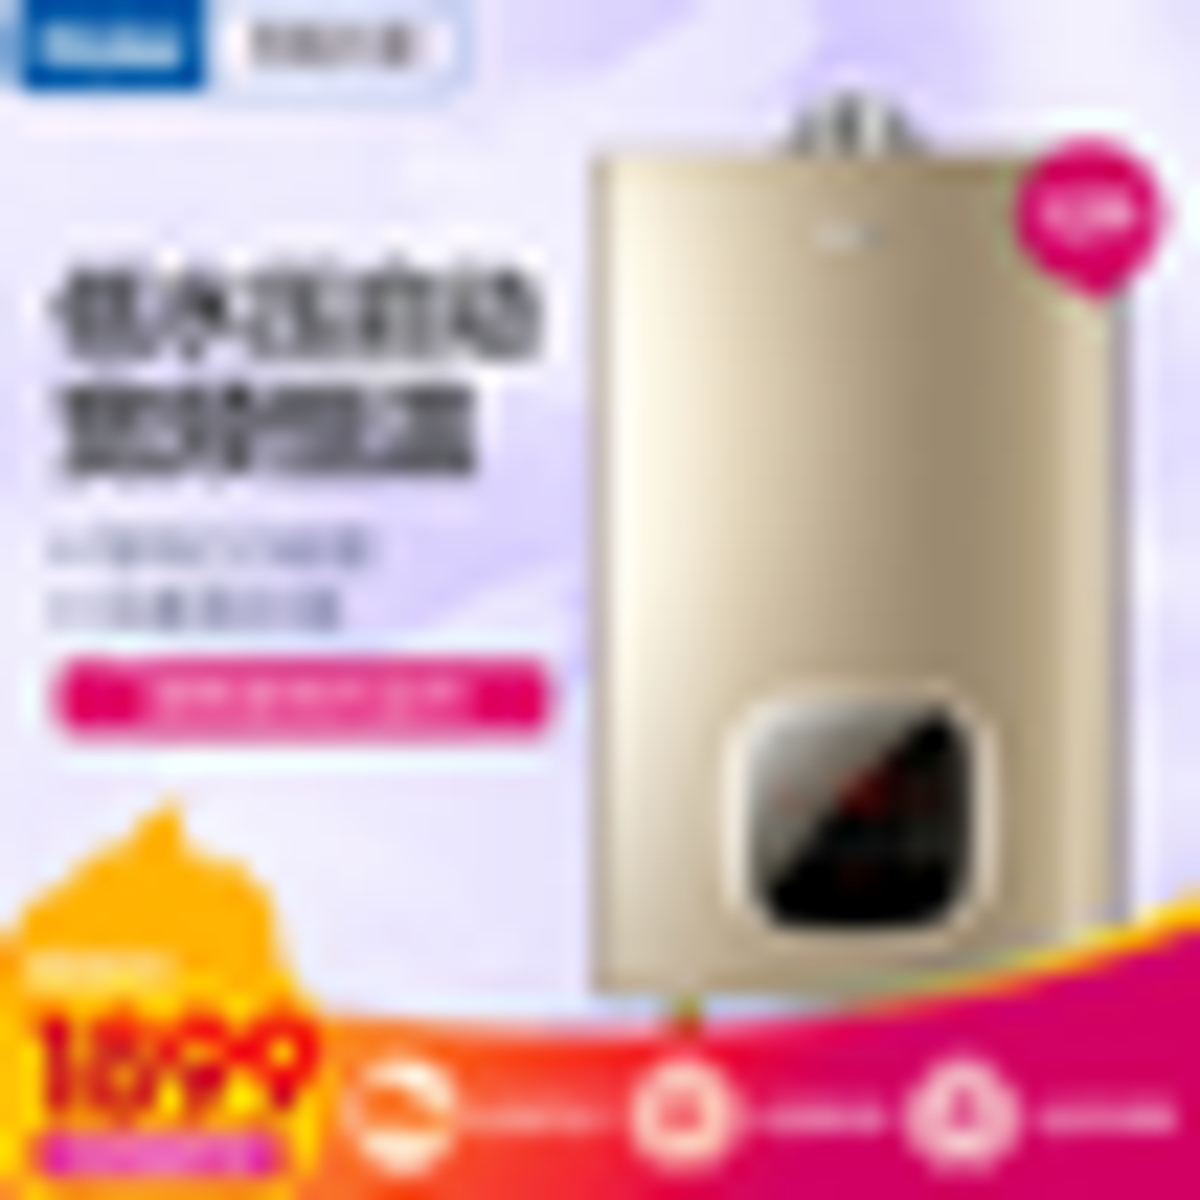 Haier/海尔 燃气热水器 JSQ24-12WT5(12T)